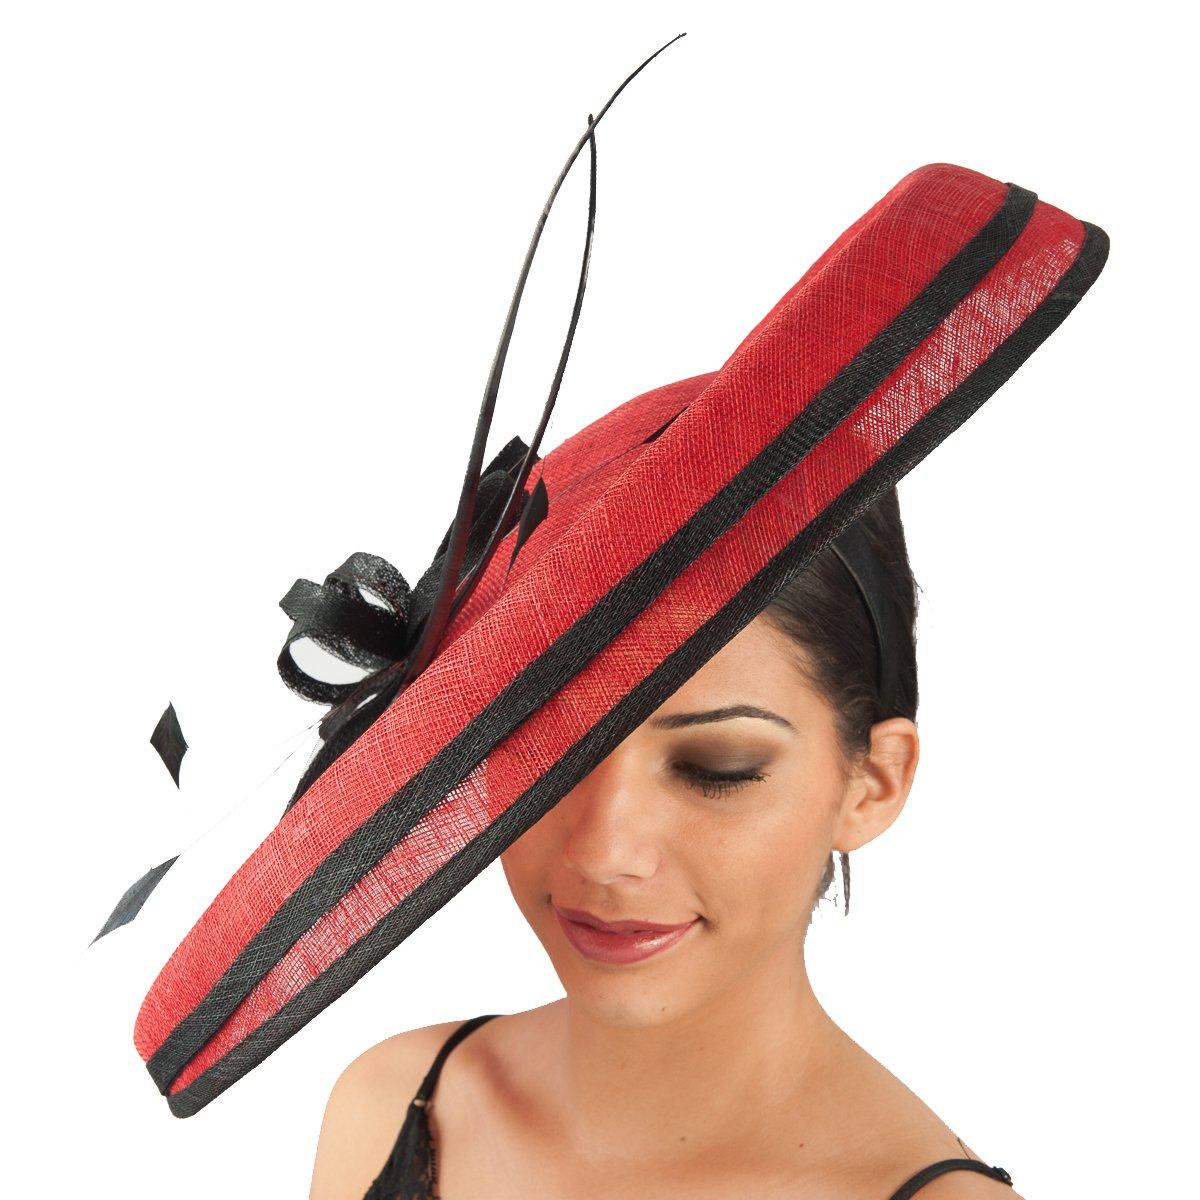 102033 - Sinamay Headband Fascinator - Red/Black by KaKyCo